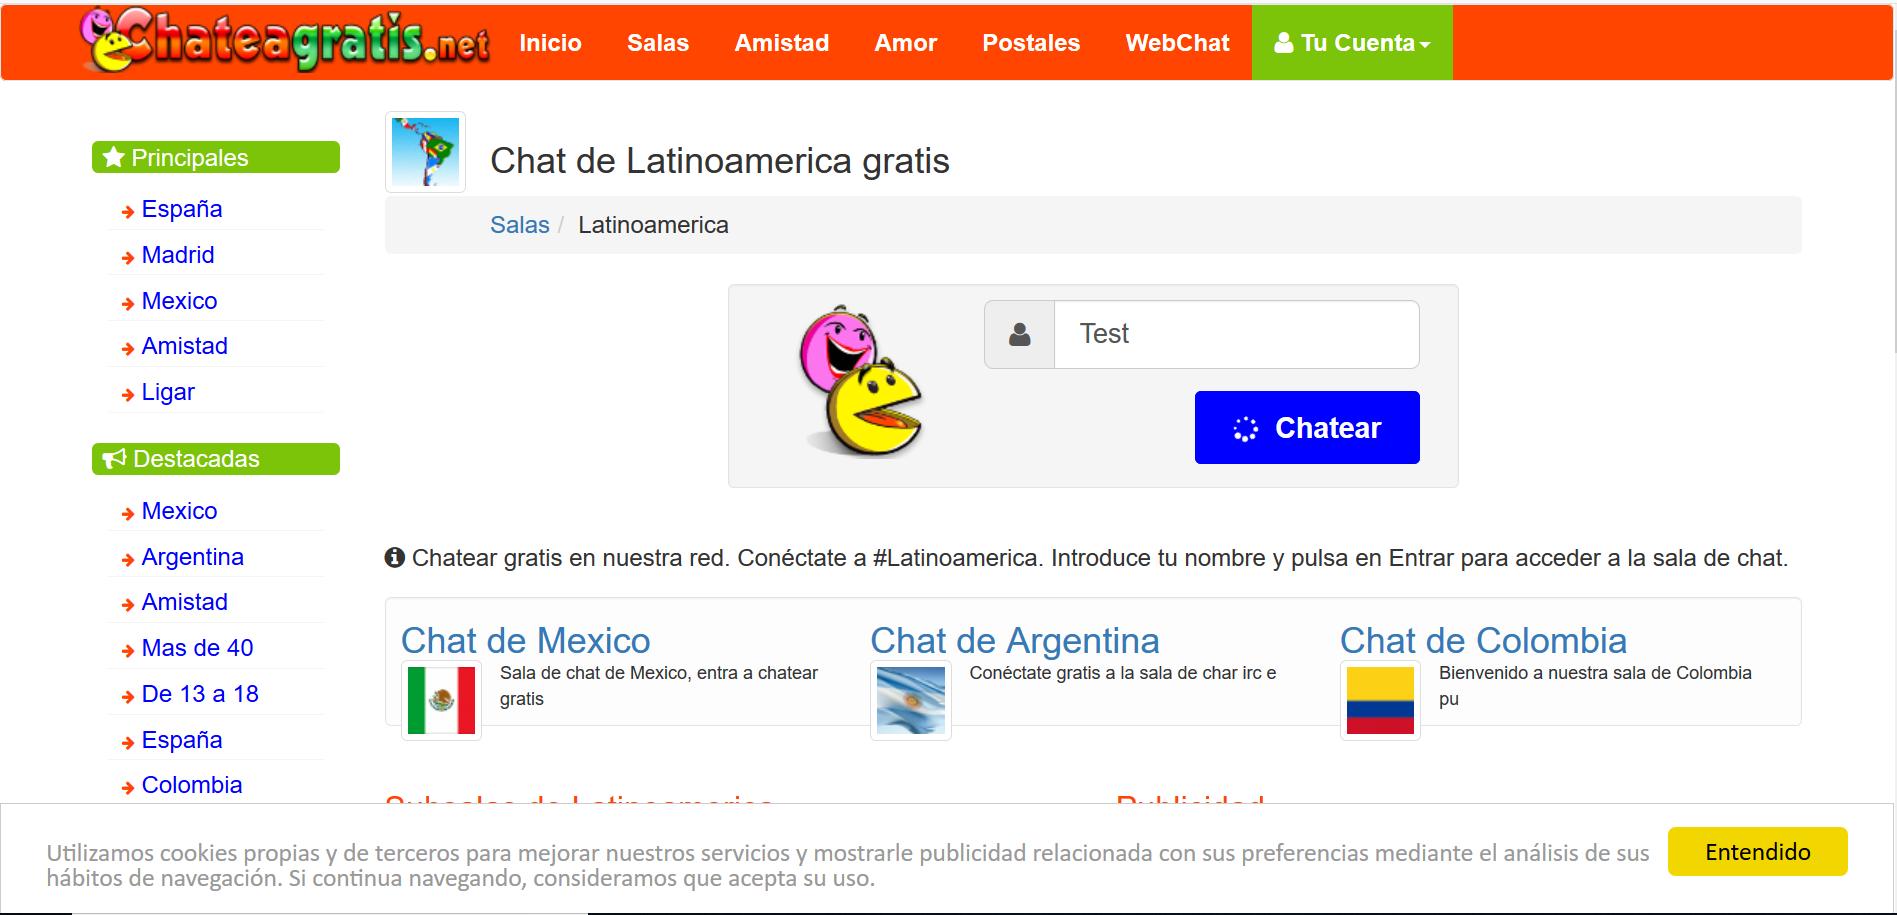 Chateagratis.net : chatea en salas regionales